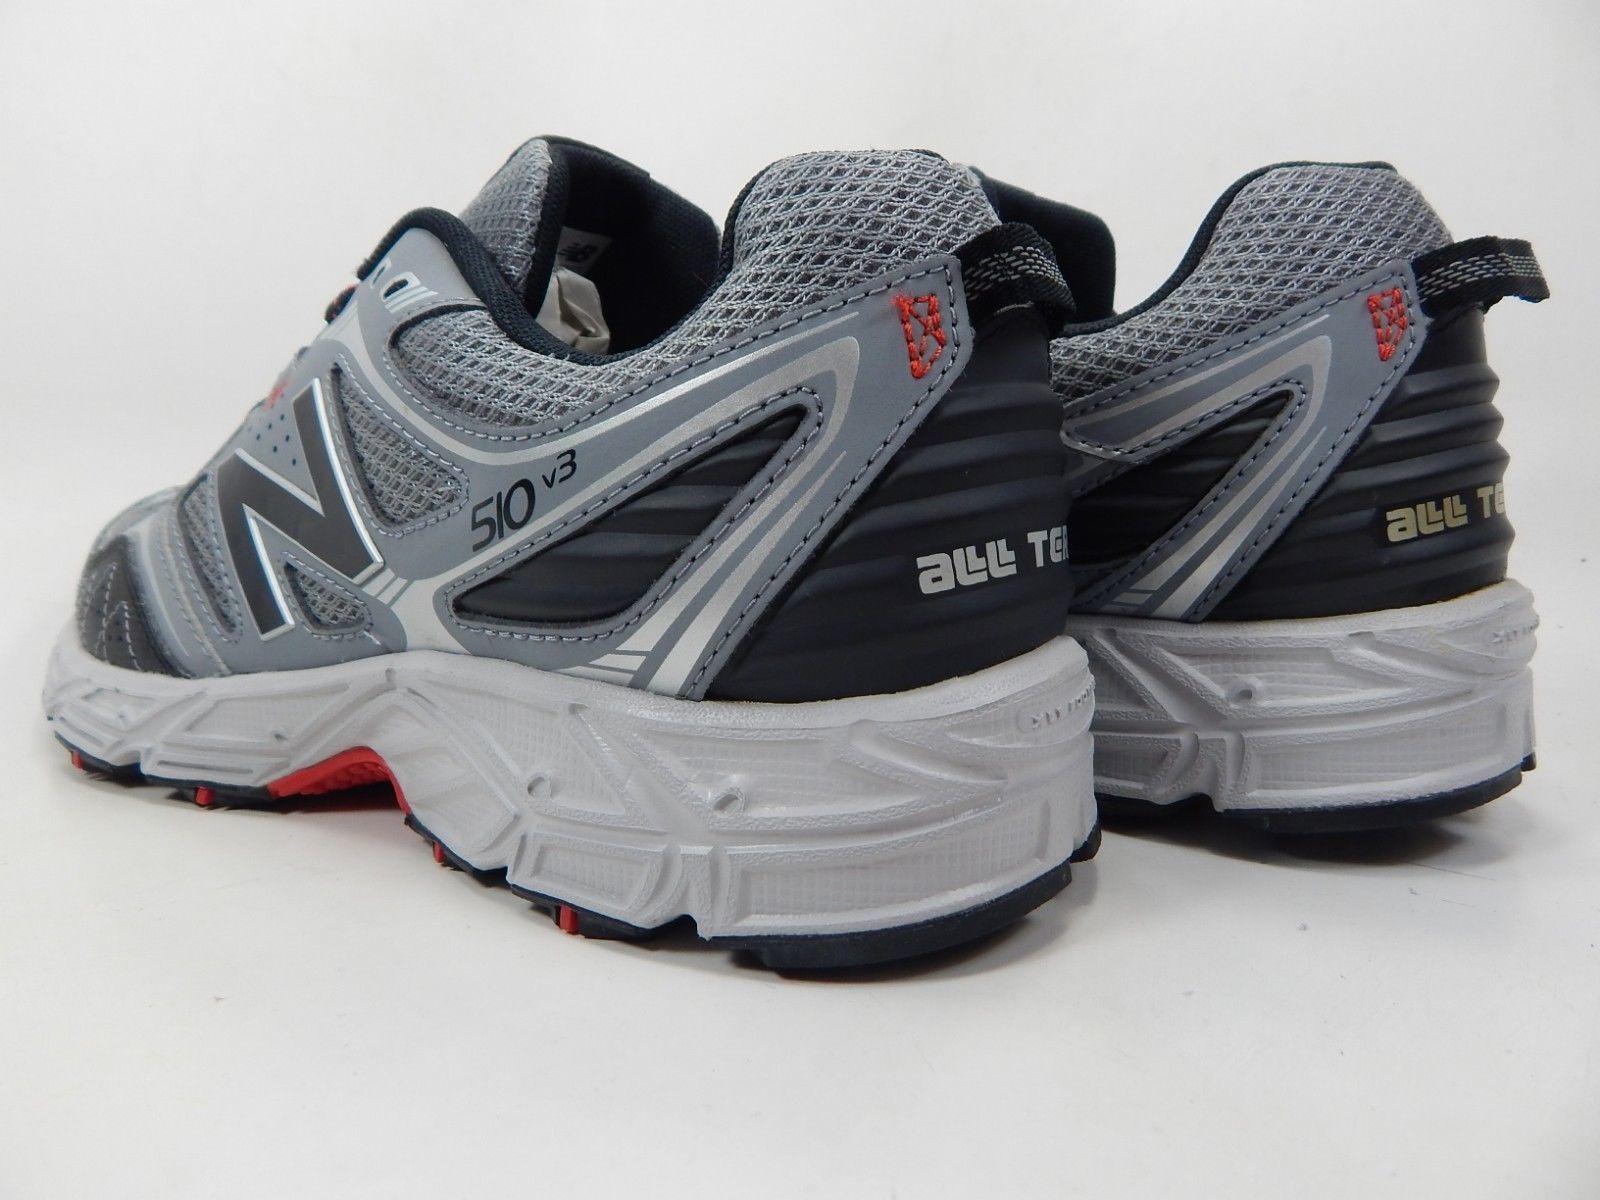 New Balance 510 v3 Size 9.5 M (D) EU 43 Men's Trail Running Shoes Gray MT510RG3